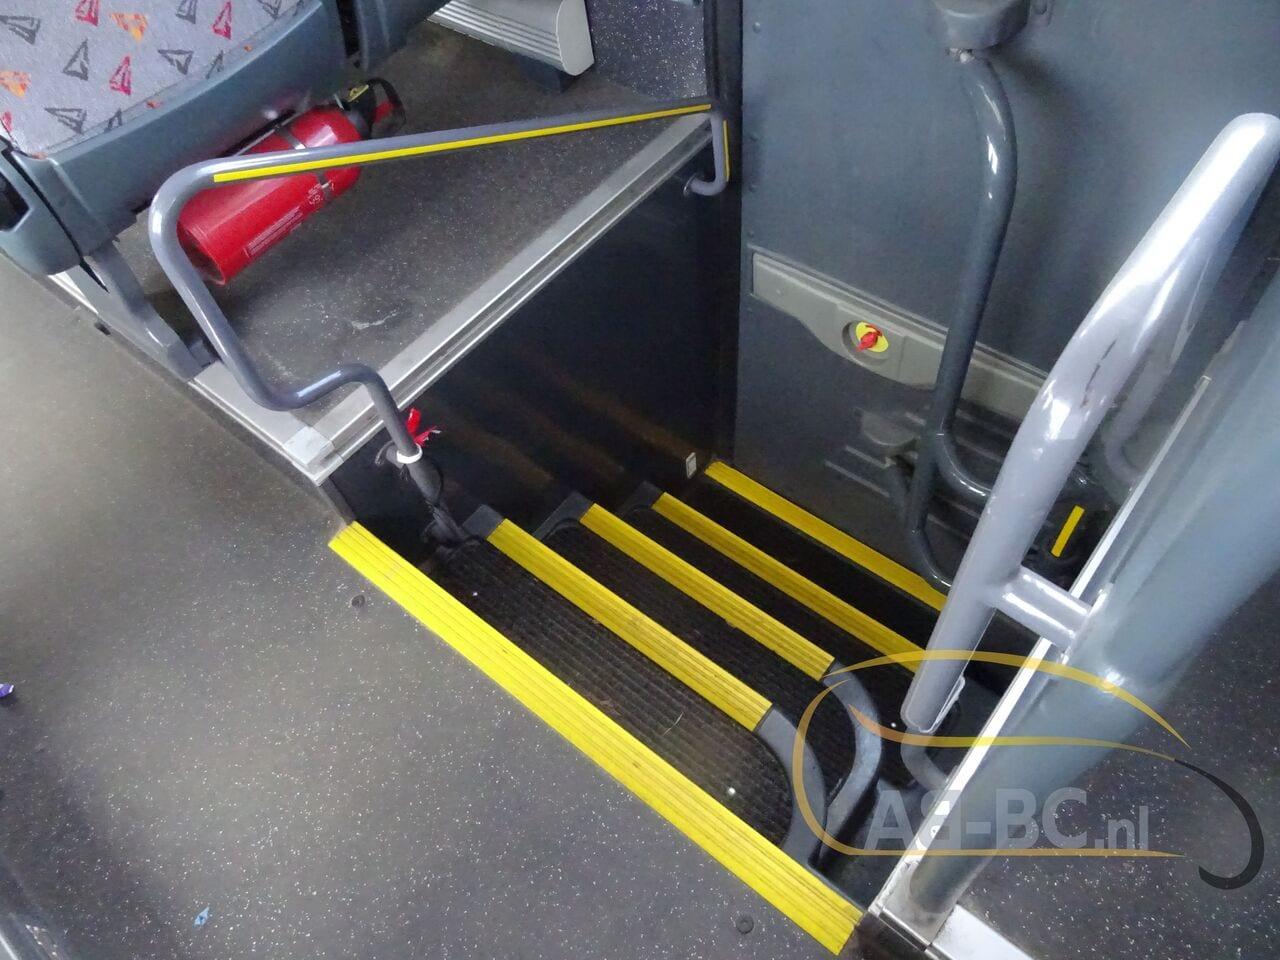 coach-busTEMSA-Safari-RD-DAF-Motor-53-Seats-Euro-5---1623932624581903122_big_aff89ef2b69230a7a87be85b929d161e--21061715155620919600